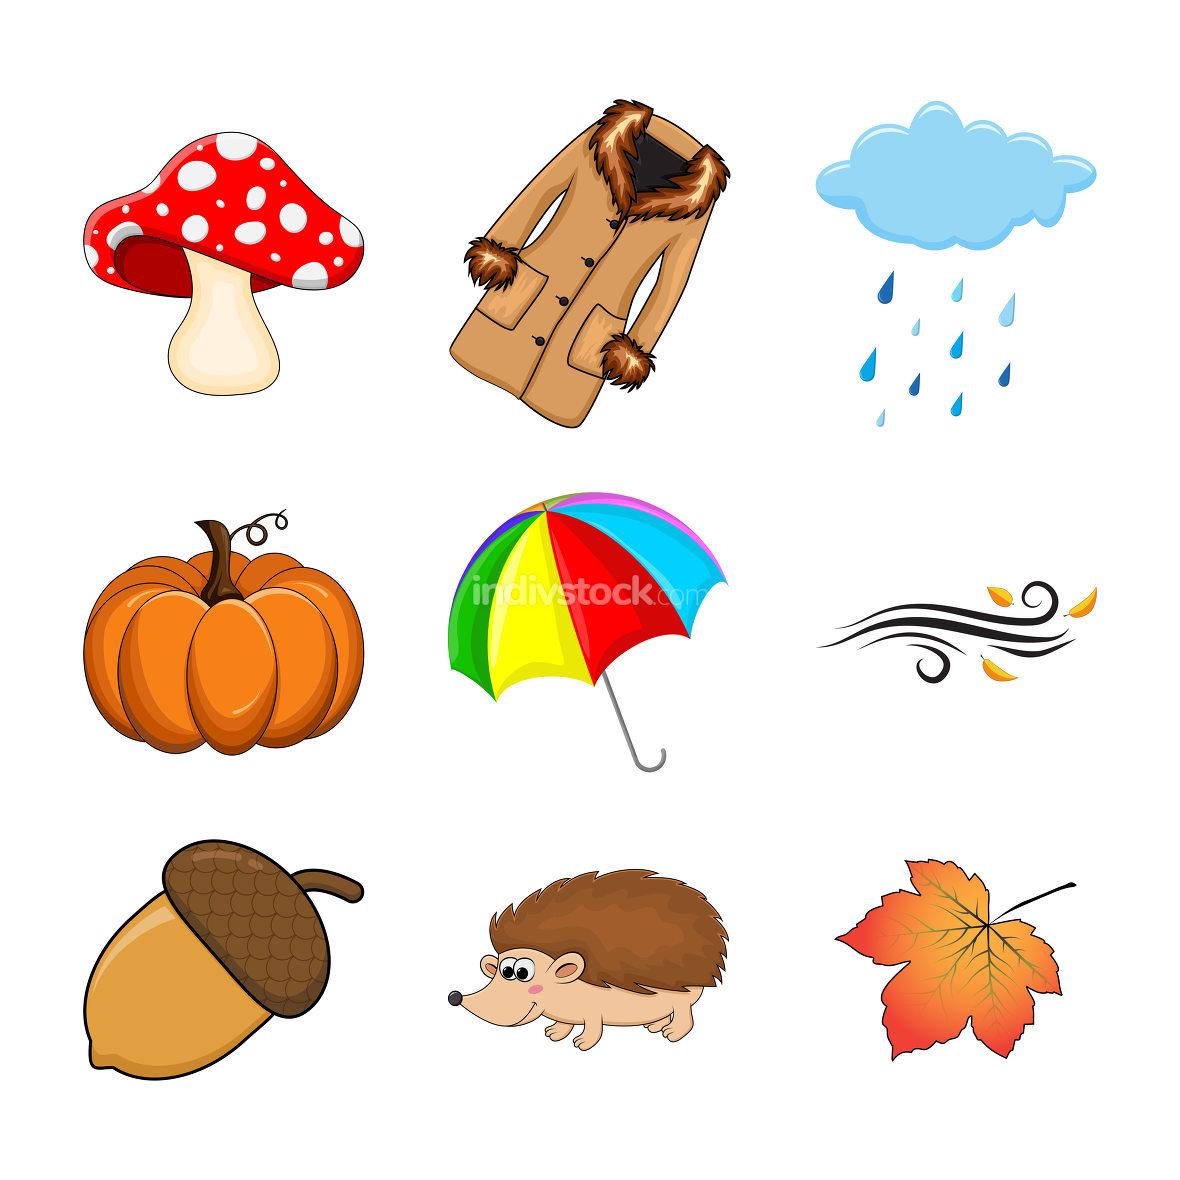 Autumn set. Autumnal cartoon symbols collection isolated on white. Fall illustration elements. Seasonal vector icons with coat, pumpkin, mushroom, umbrella, acorn, rain, cloud, hedgehog, wind, leaf